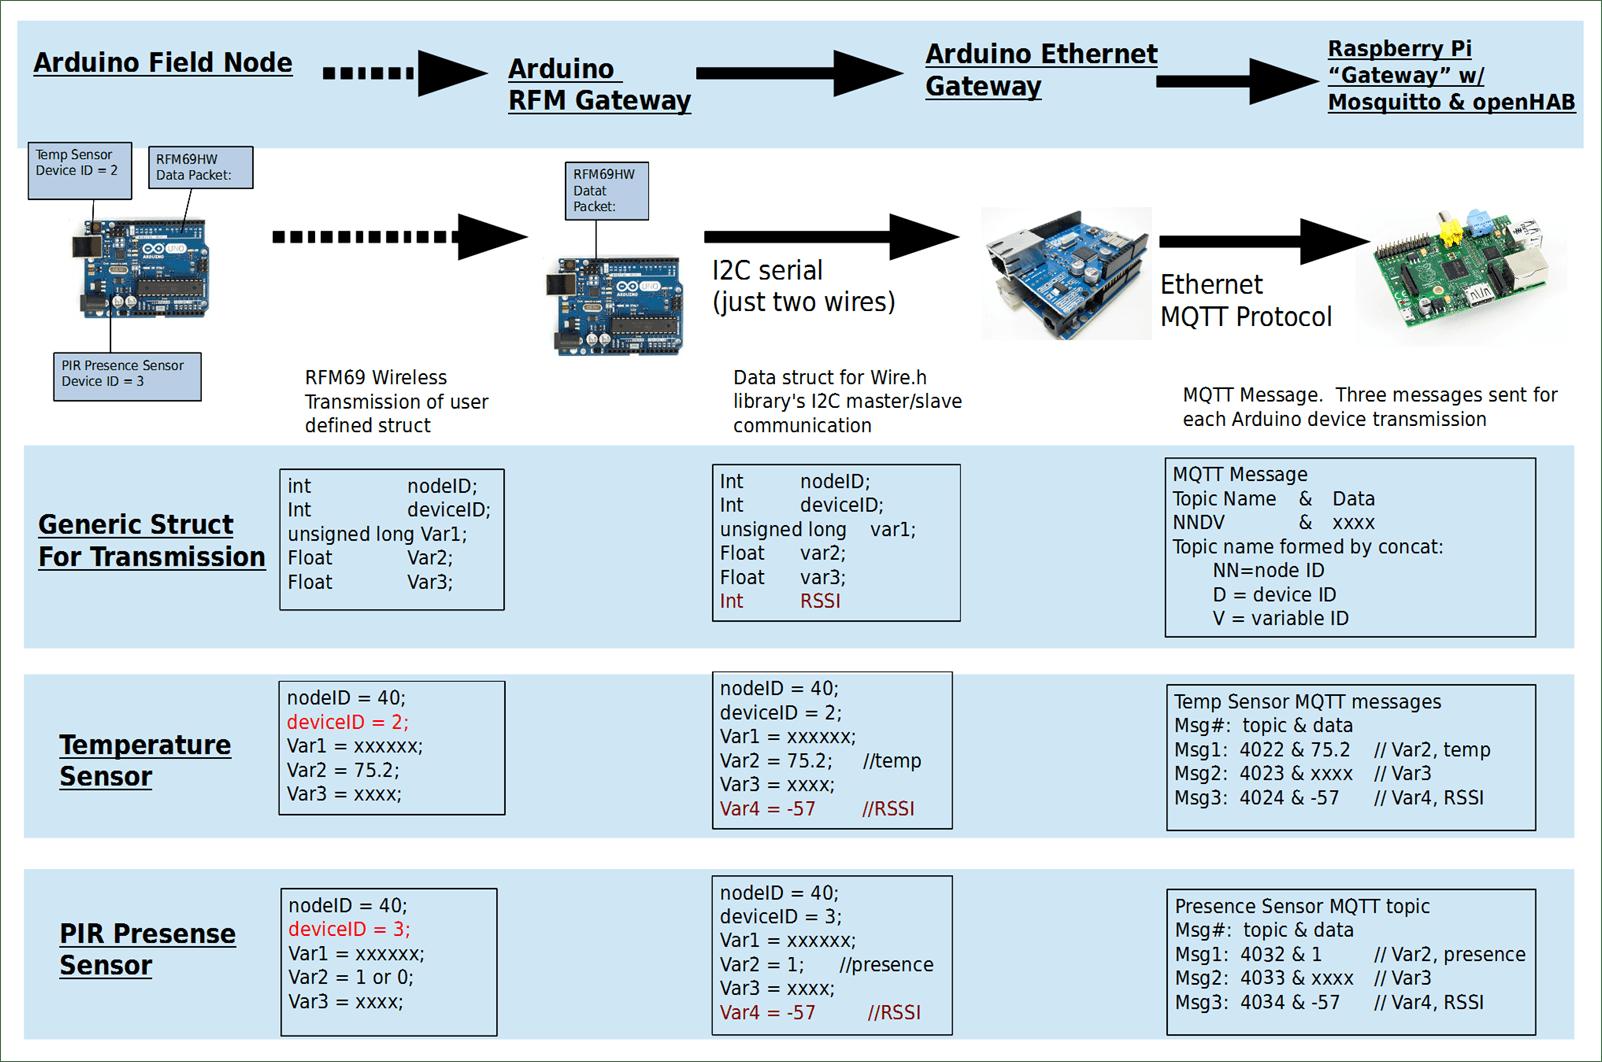 Translation of wireless data to MQTT publishes